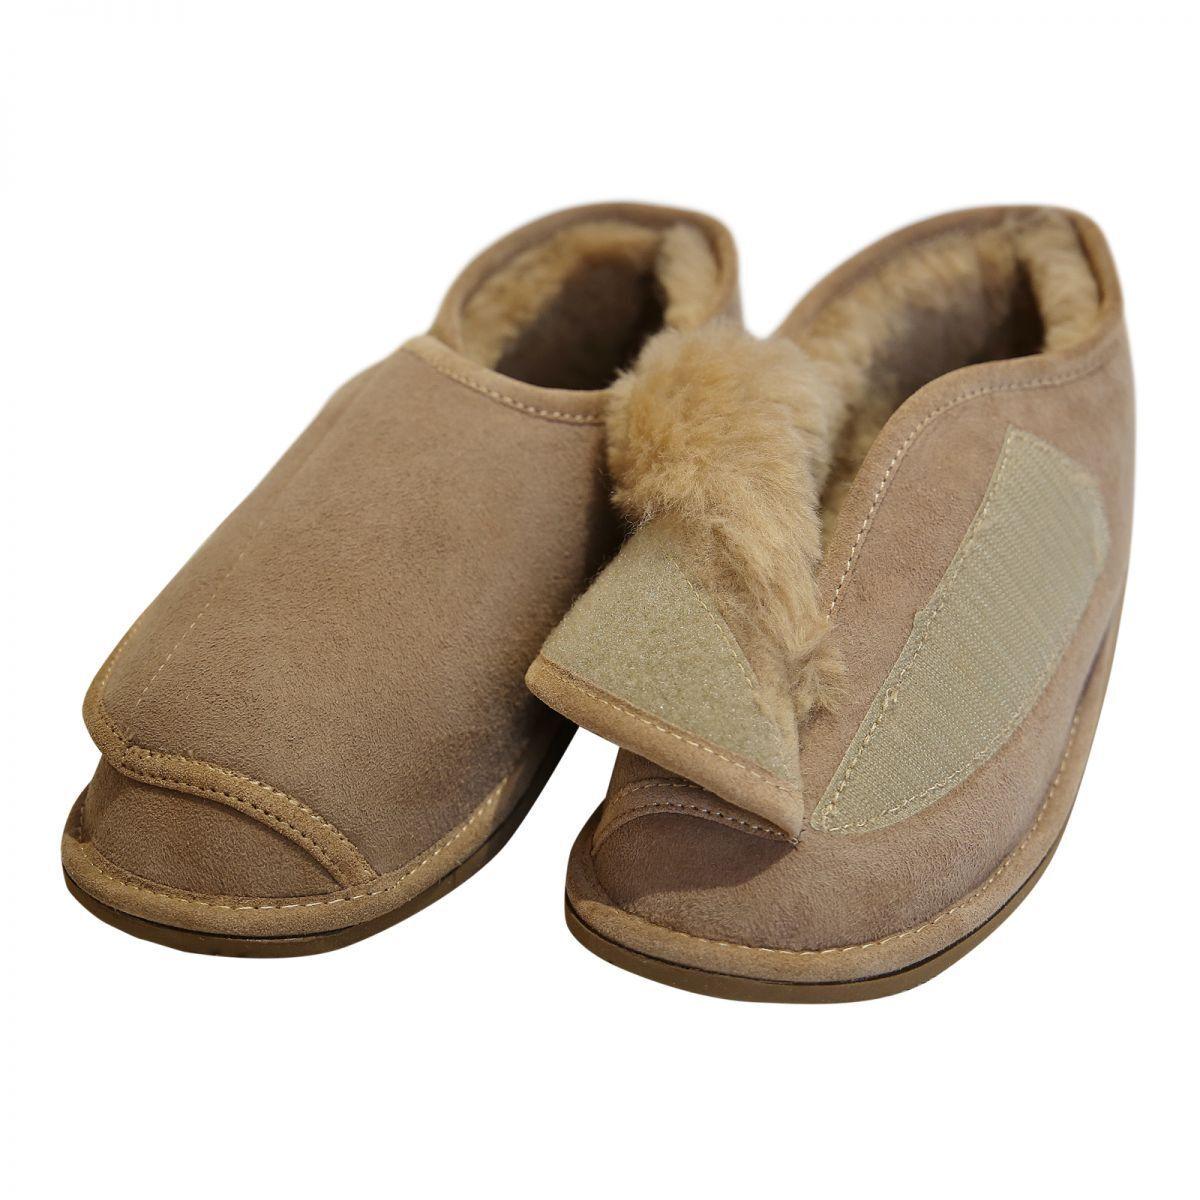 2 von 7 Lammfell Hausschuhe - CHRISTEL Damen Herren Schuhe Klettverschluss f6bb4ae0b0